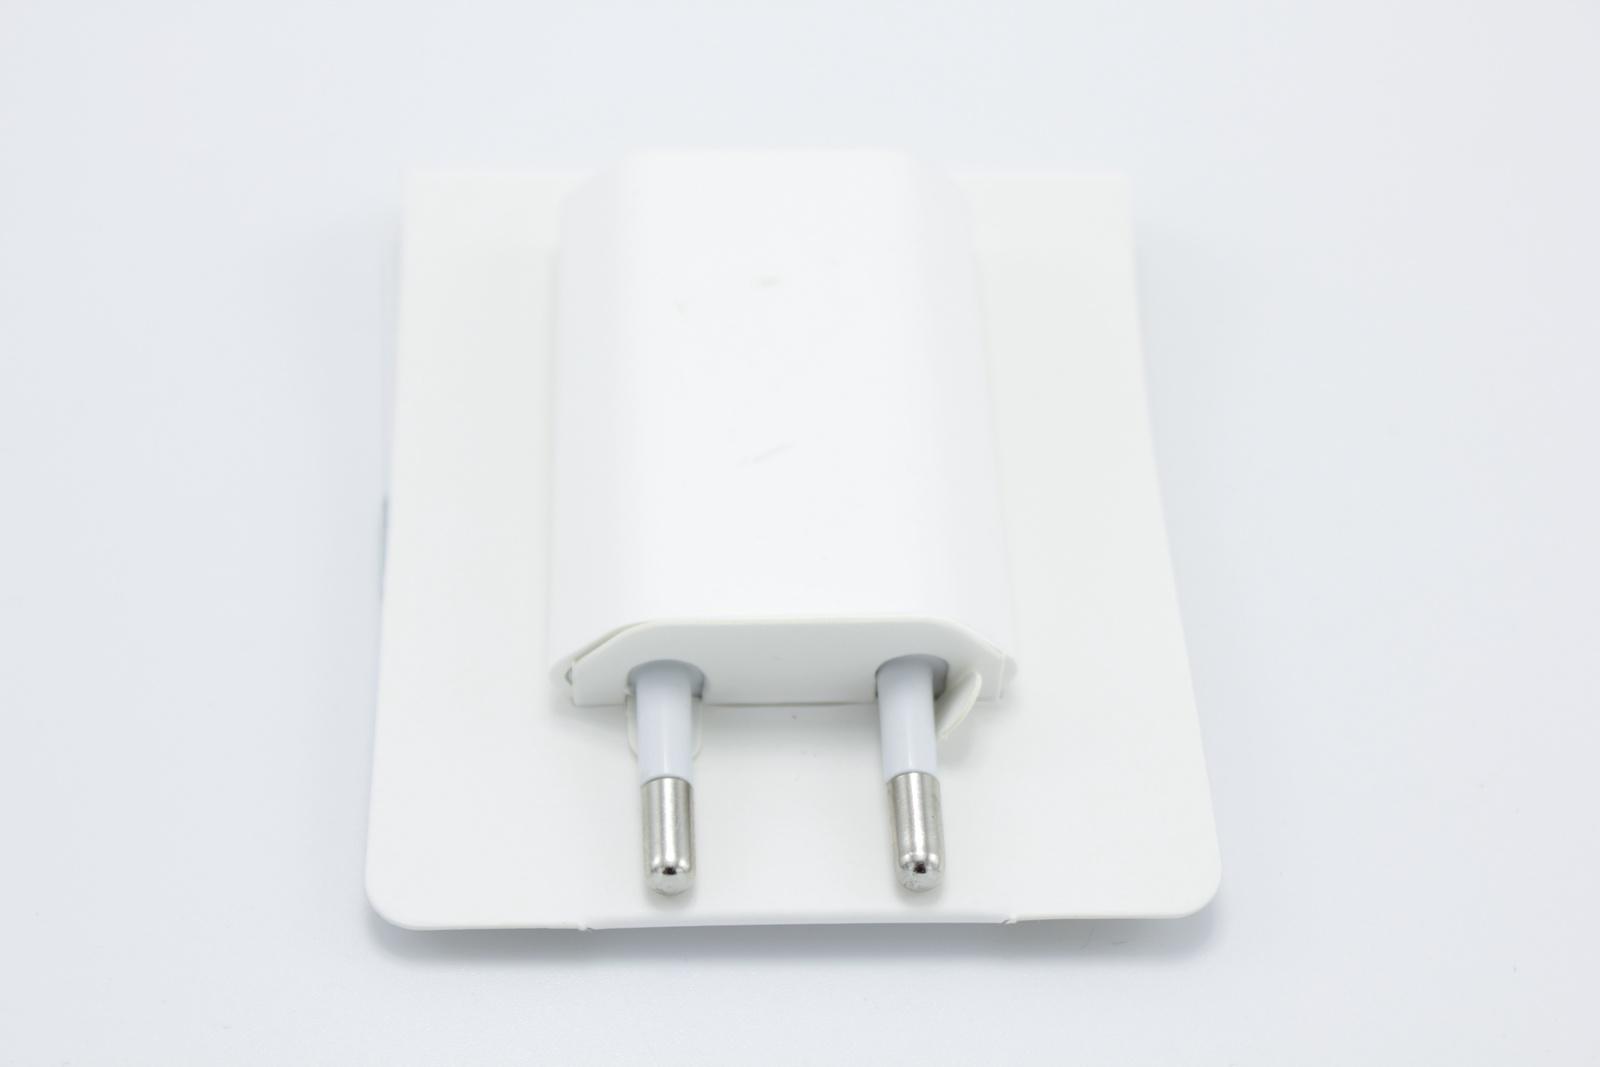 Зарядное устройство, адаптер-вилка для Apple iPhone все цены